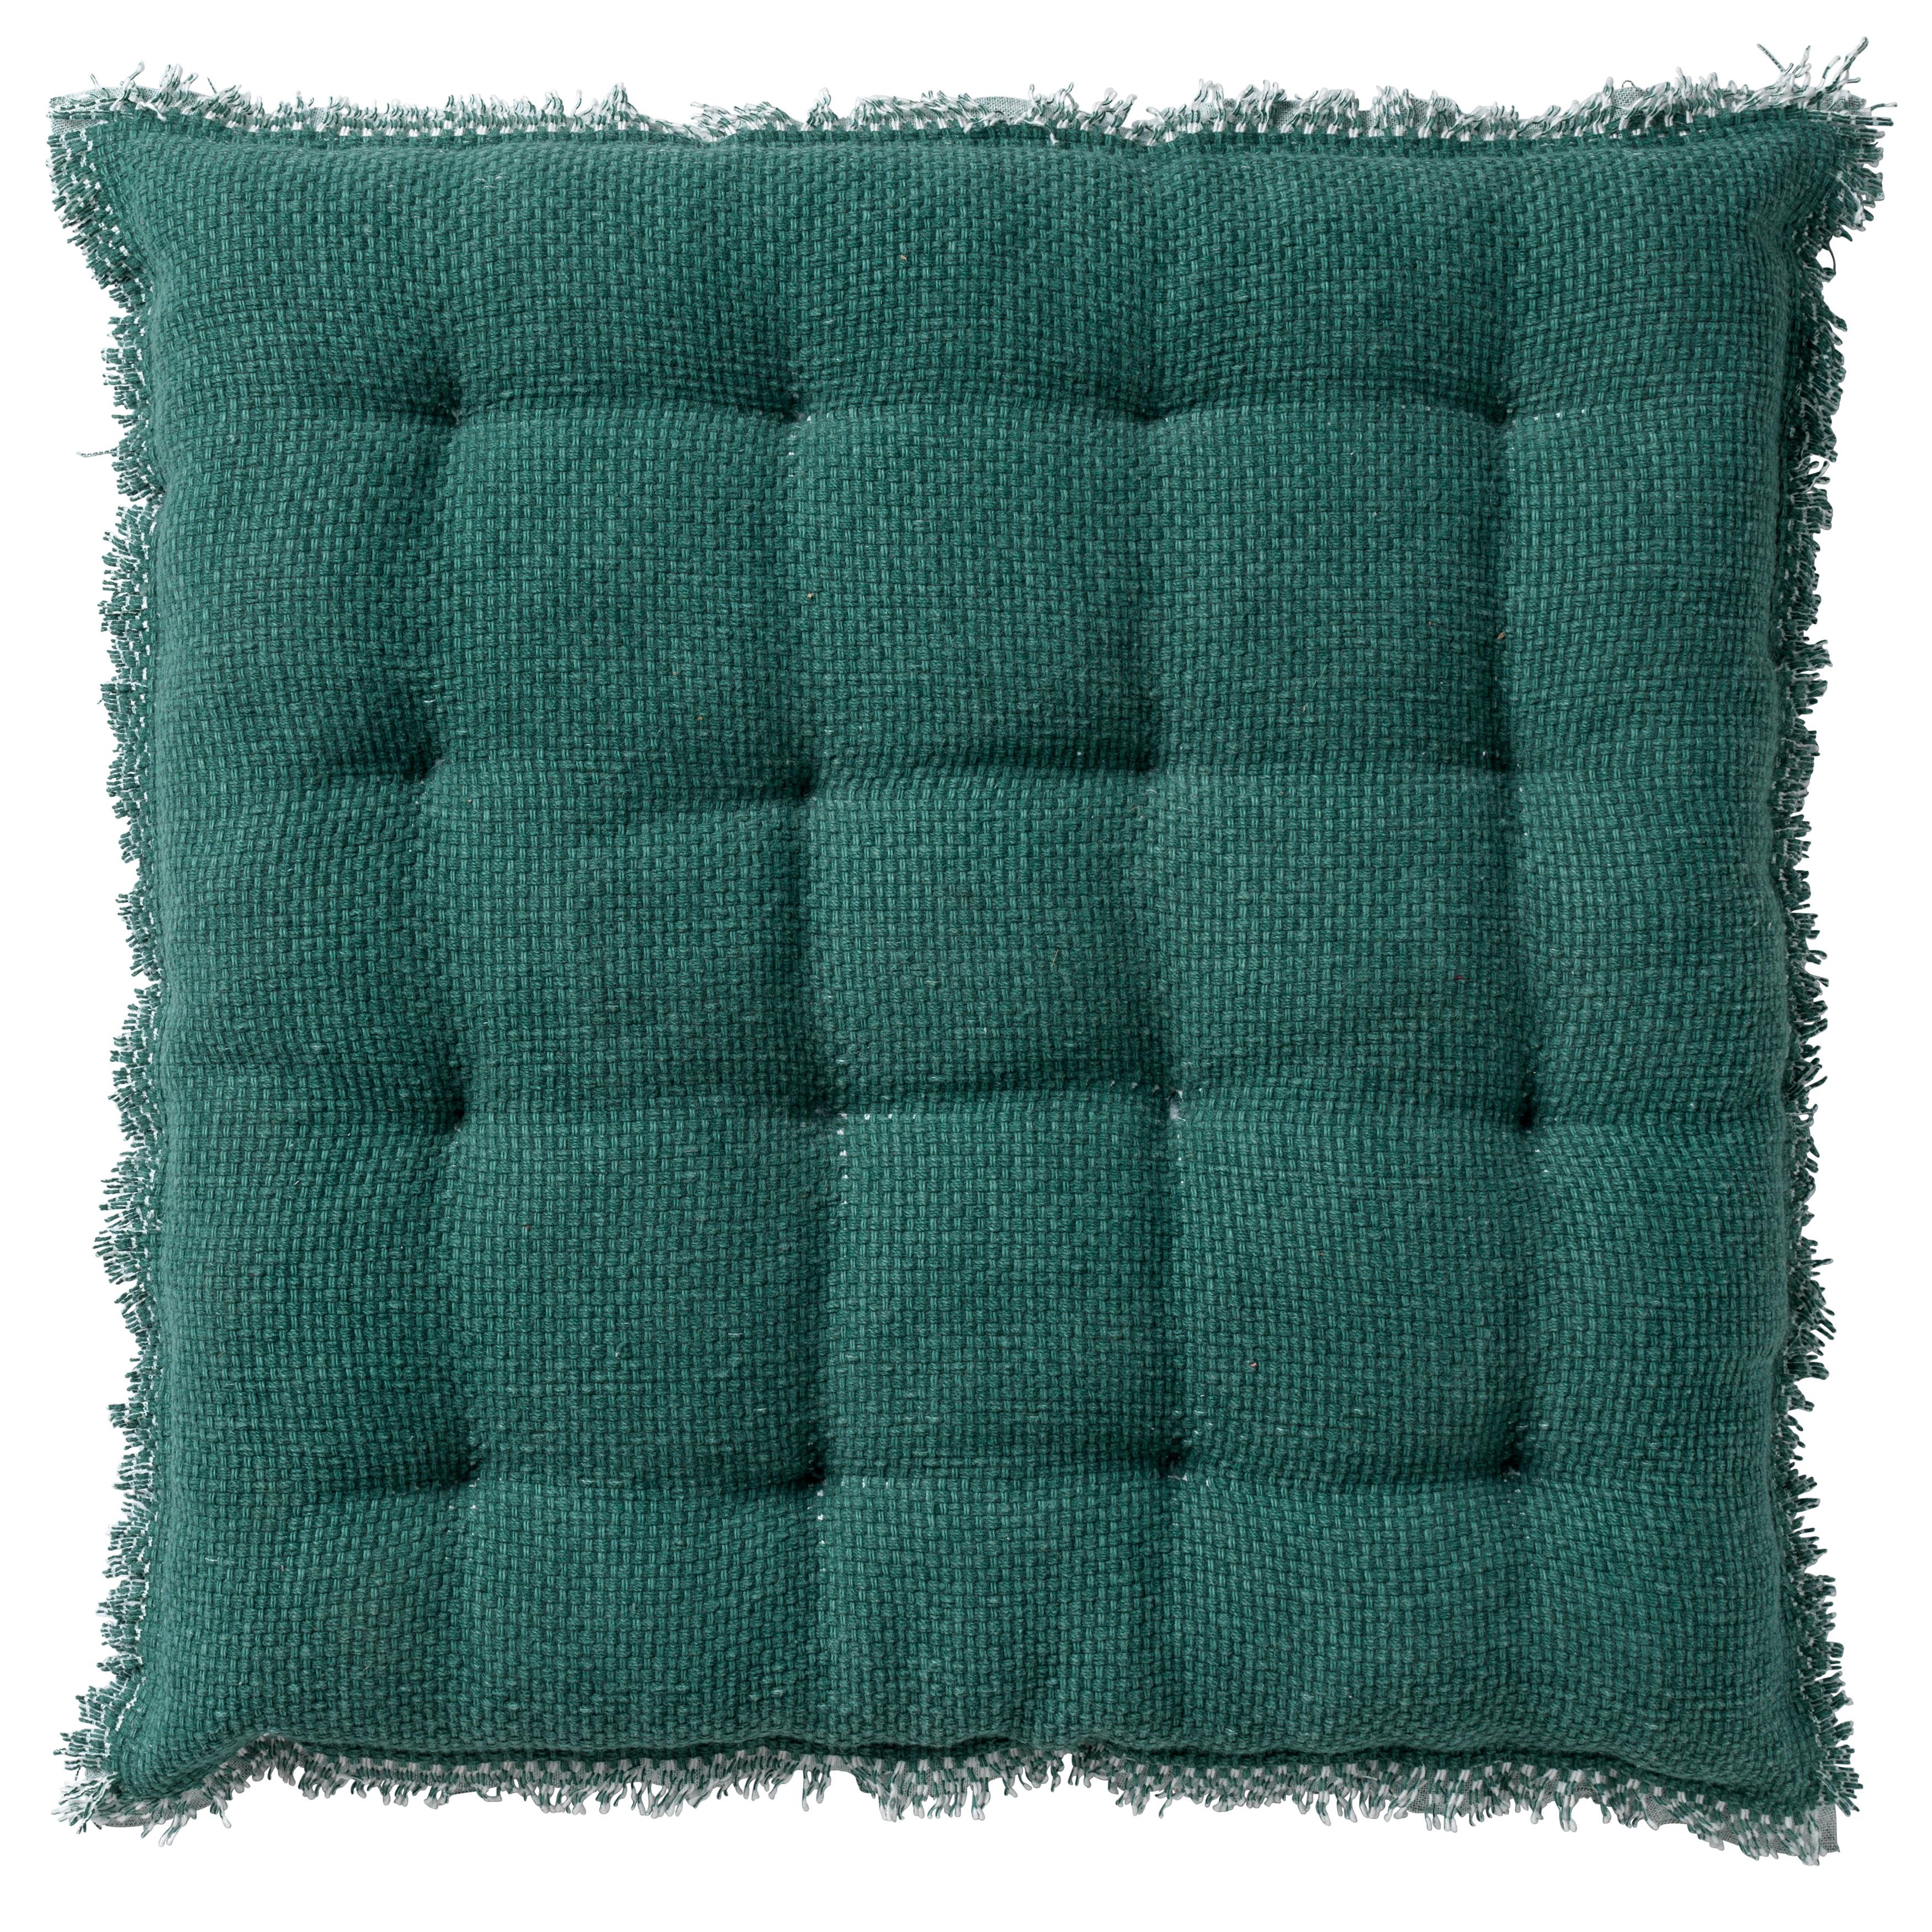 Coussin de sol en coton Vert pin 40x40